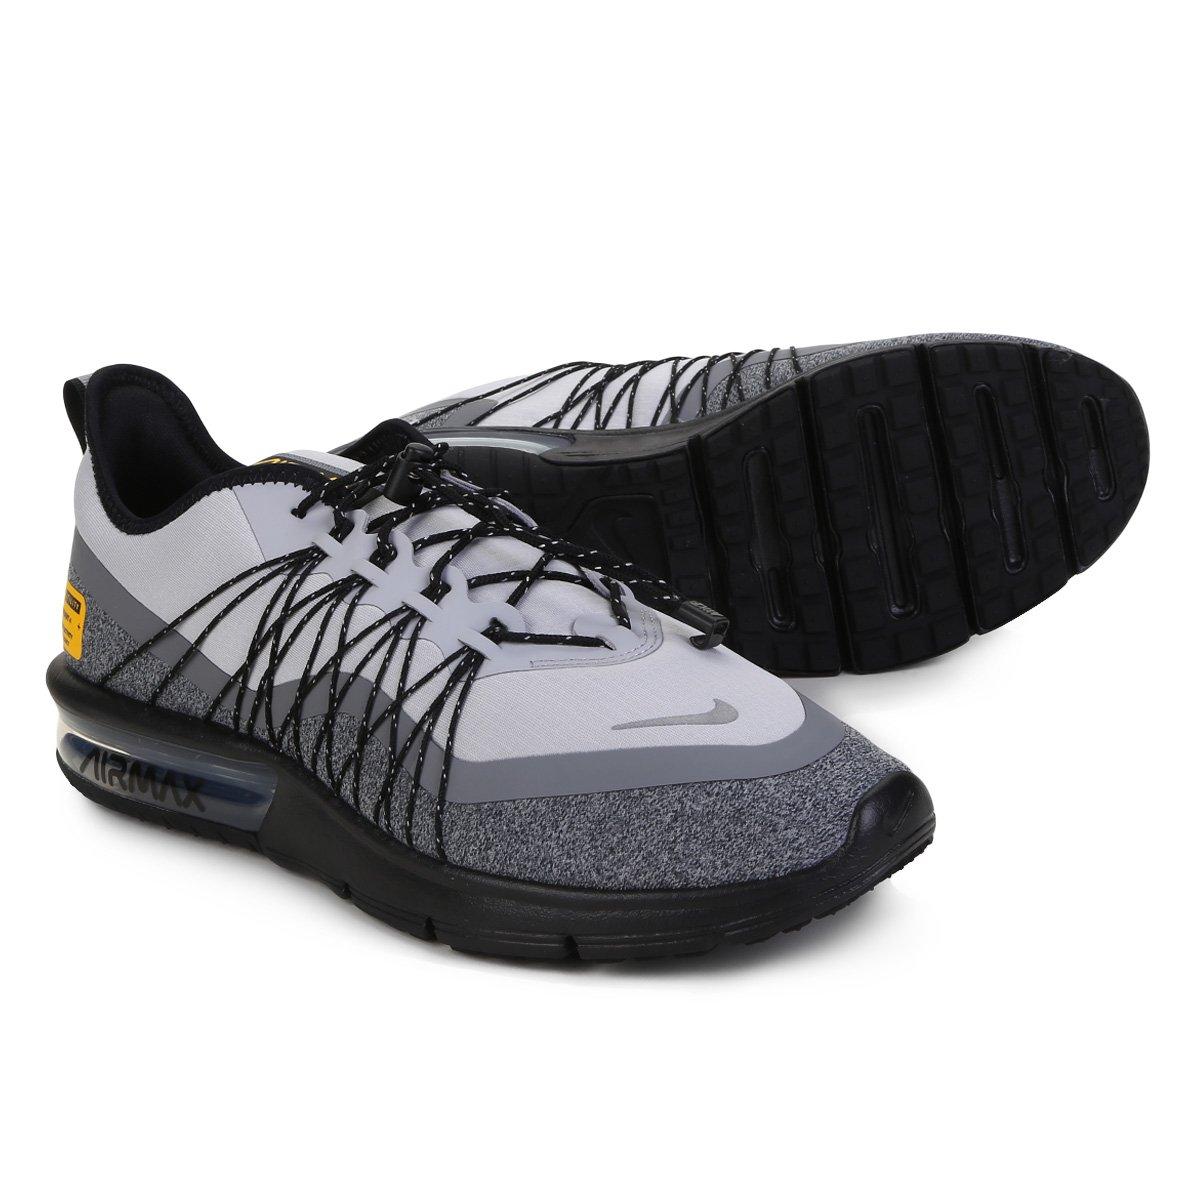 a1e368538c5 Tênis Nike Air Max Sequent 4 Utility Masculino - Cinza e Preto - Compre  Agora